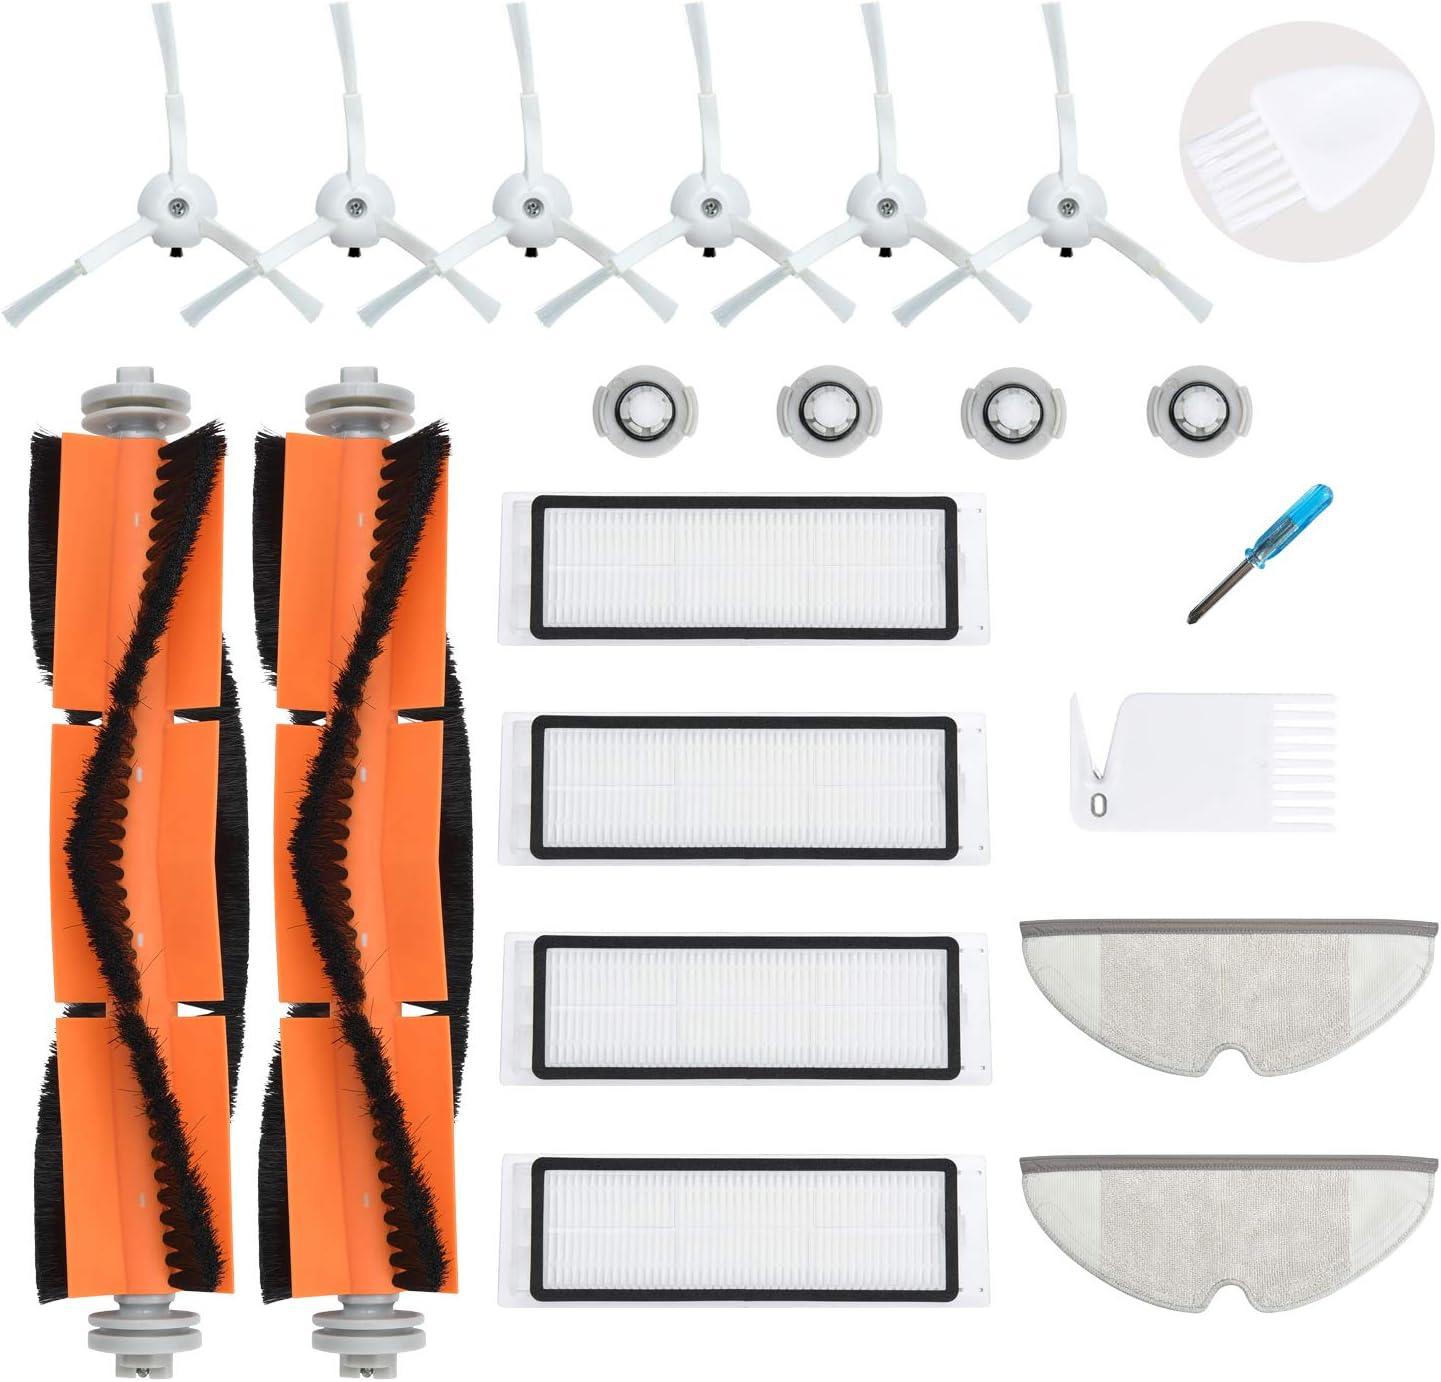 Replacement For Xiaomi Roborock S6 S5 MAX S60 Vacuum Cleaner Accessories Parts